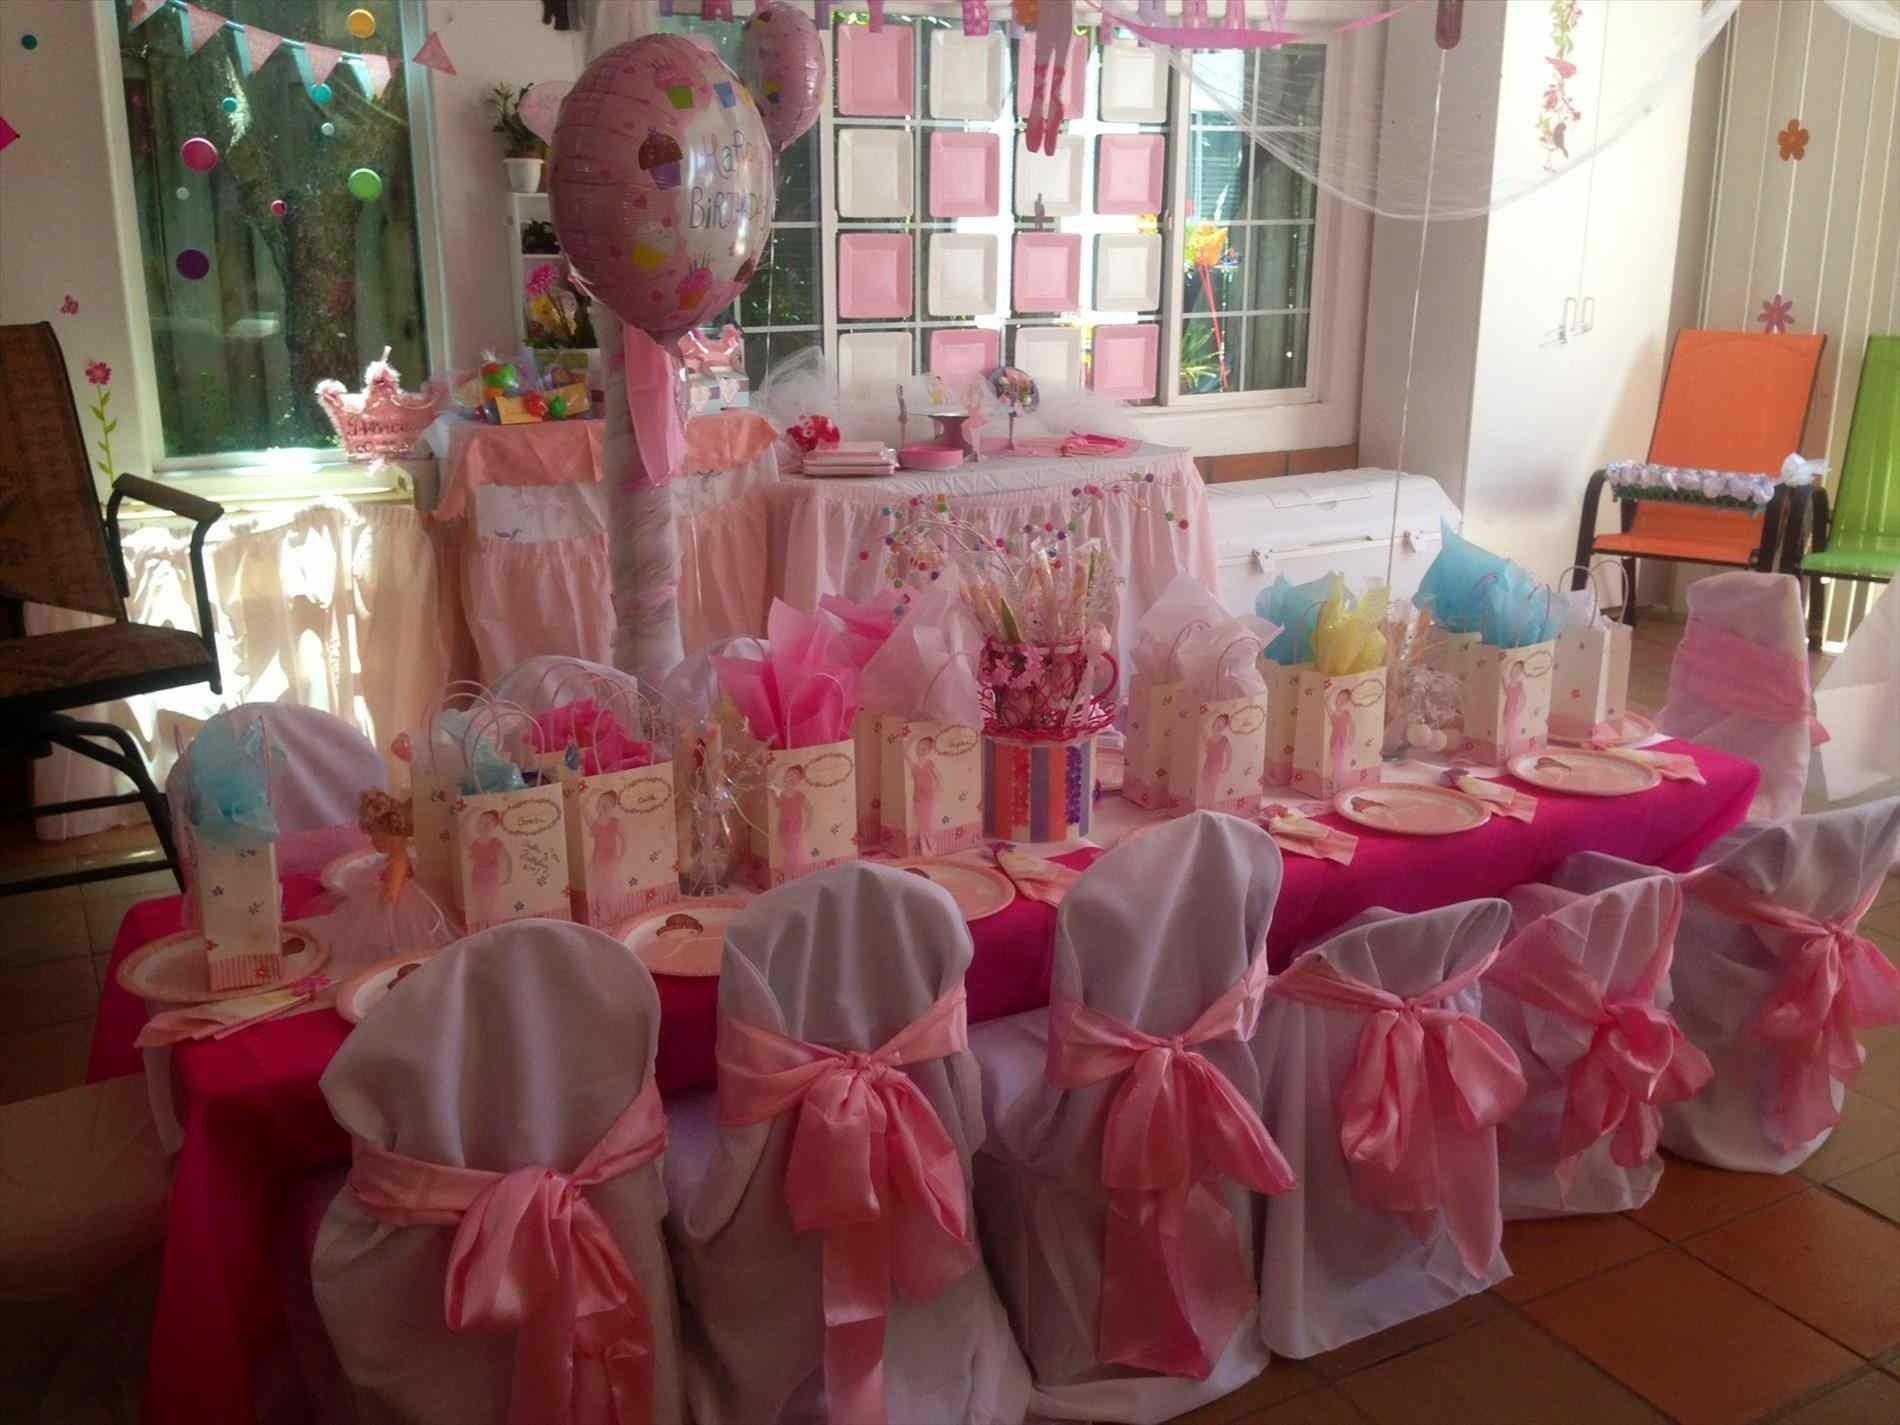 10 Wonderful Tea Party Ideas For Little Girls good tea party ideas for little girls at home how to host 1 2021